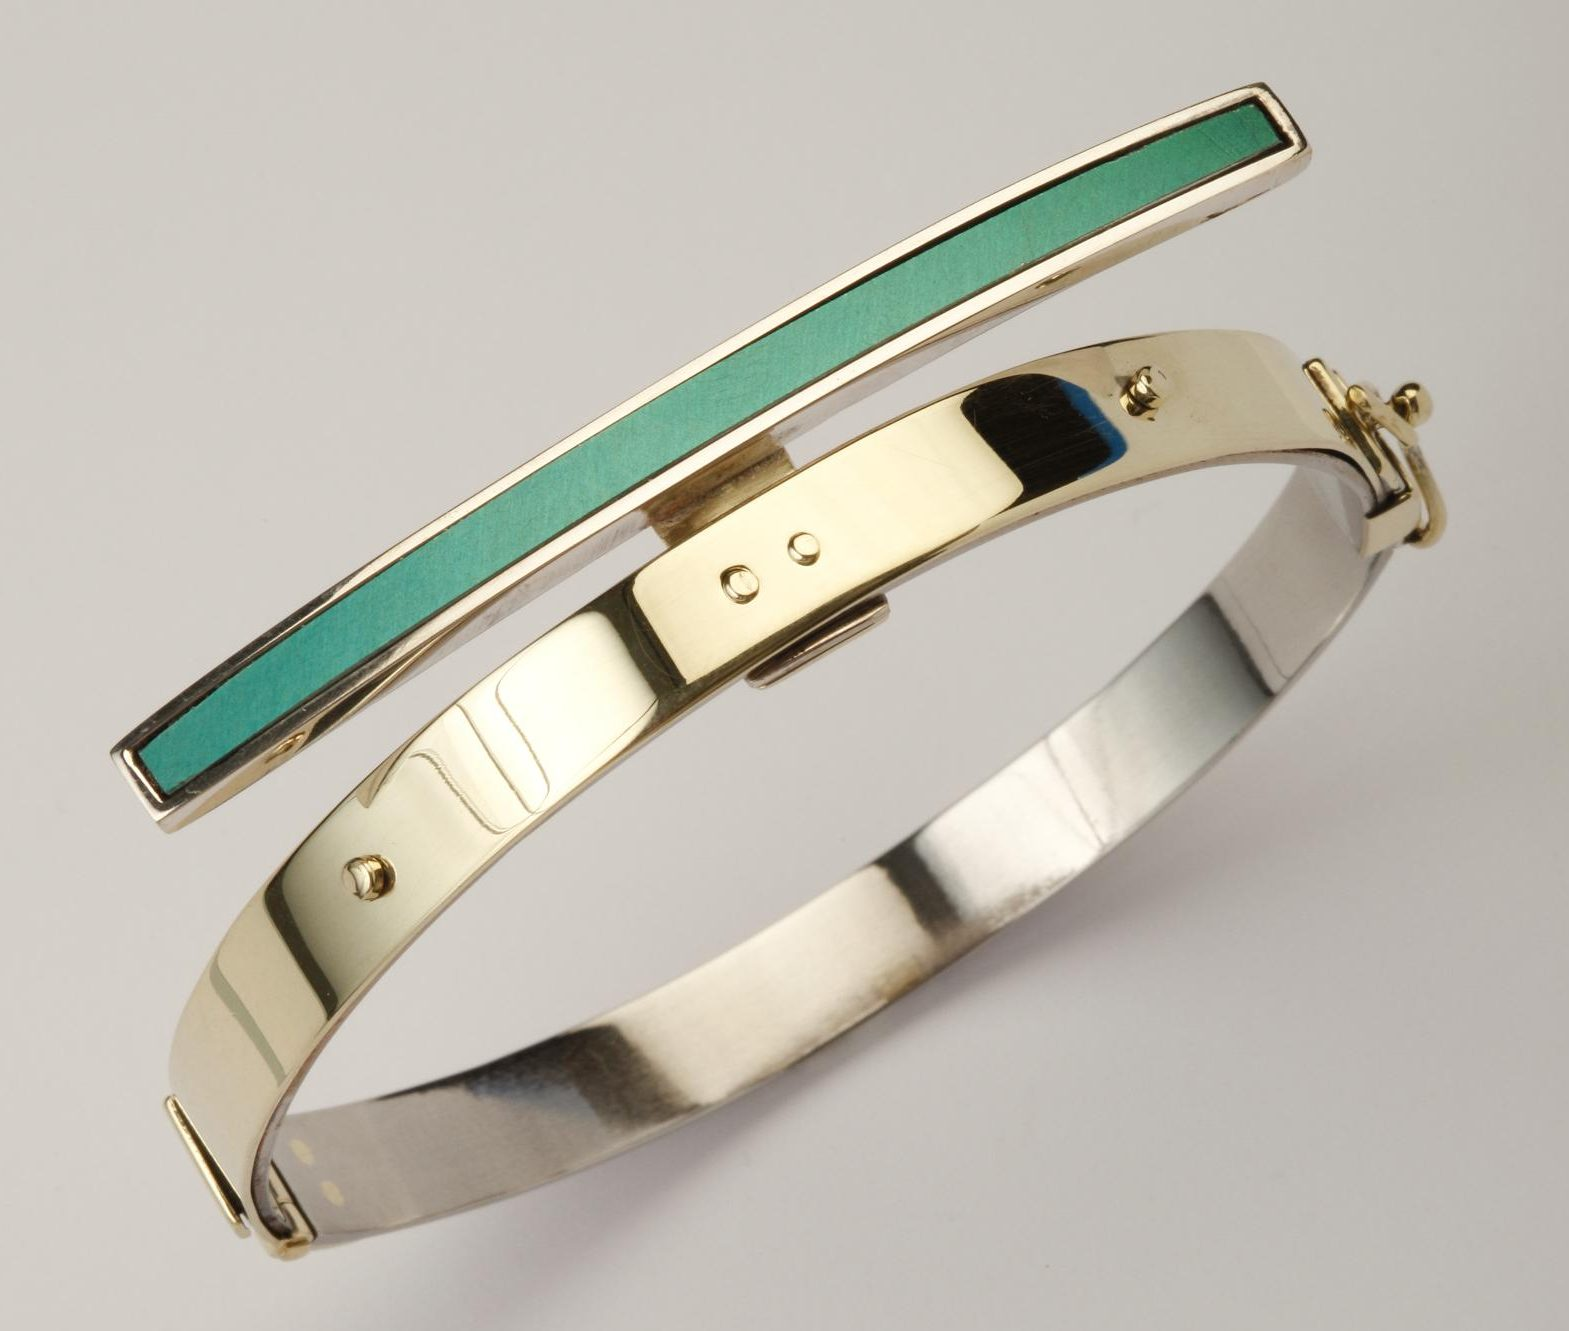 Karel Betman, armband, goud, zilver, aluminium, roestvrij staal